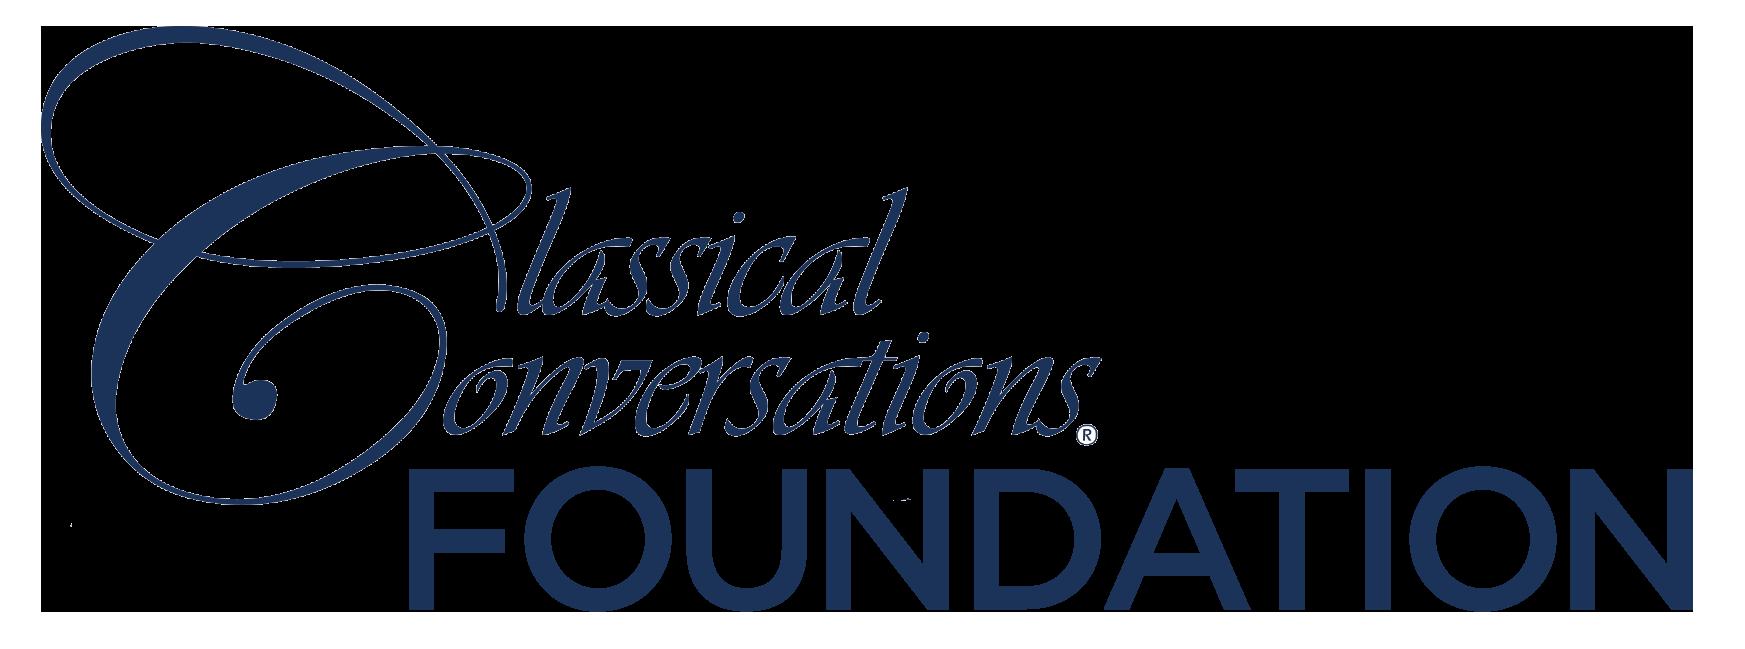 Classical Conversations Foundation